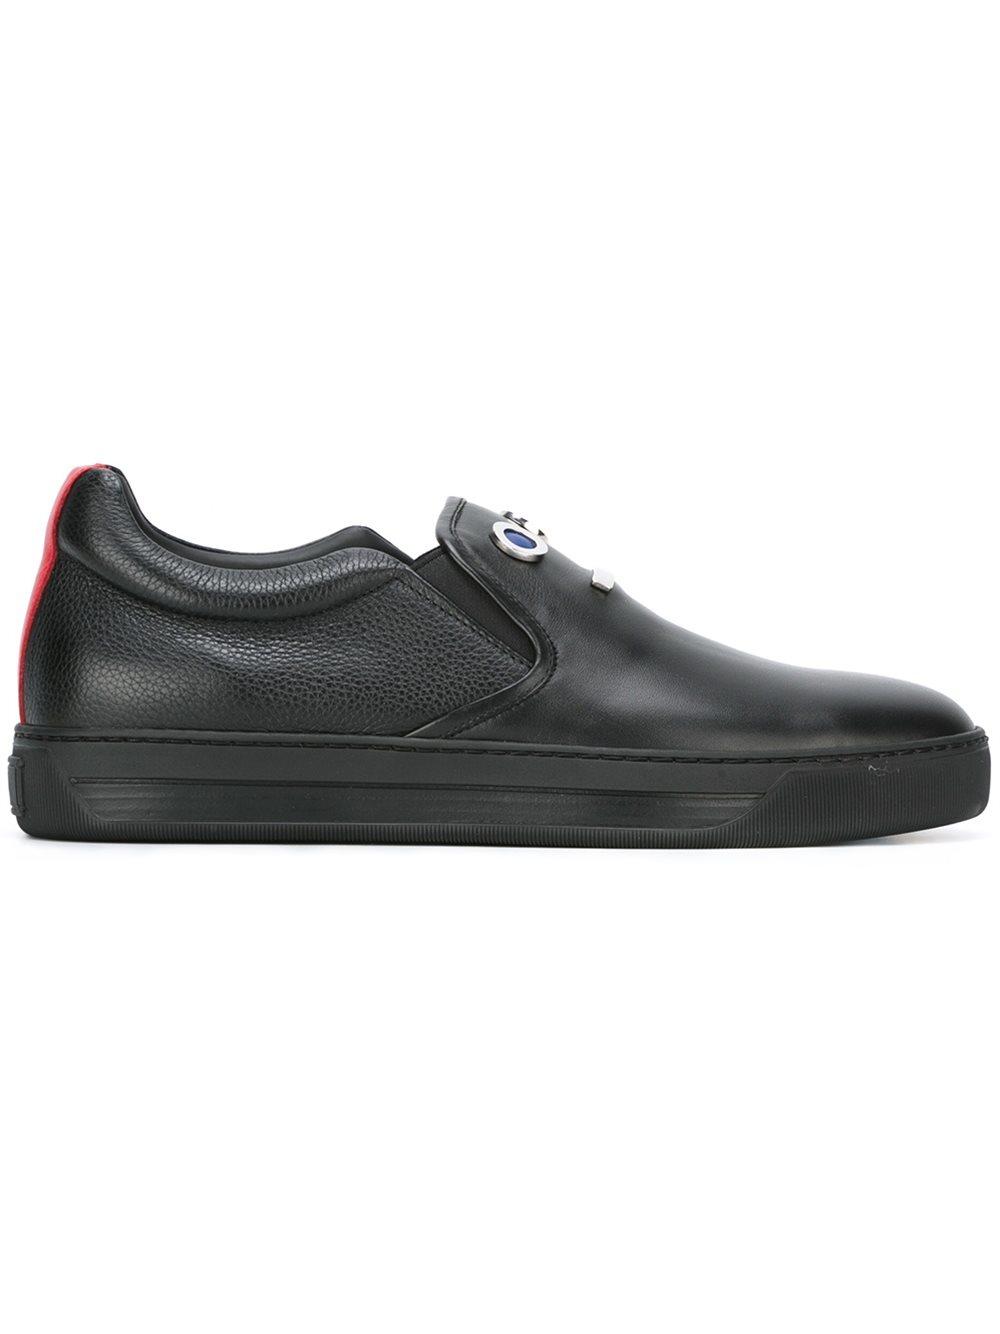 fendi appliqu 233 slip on sneakers in black for lyst